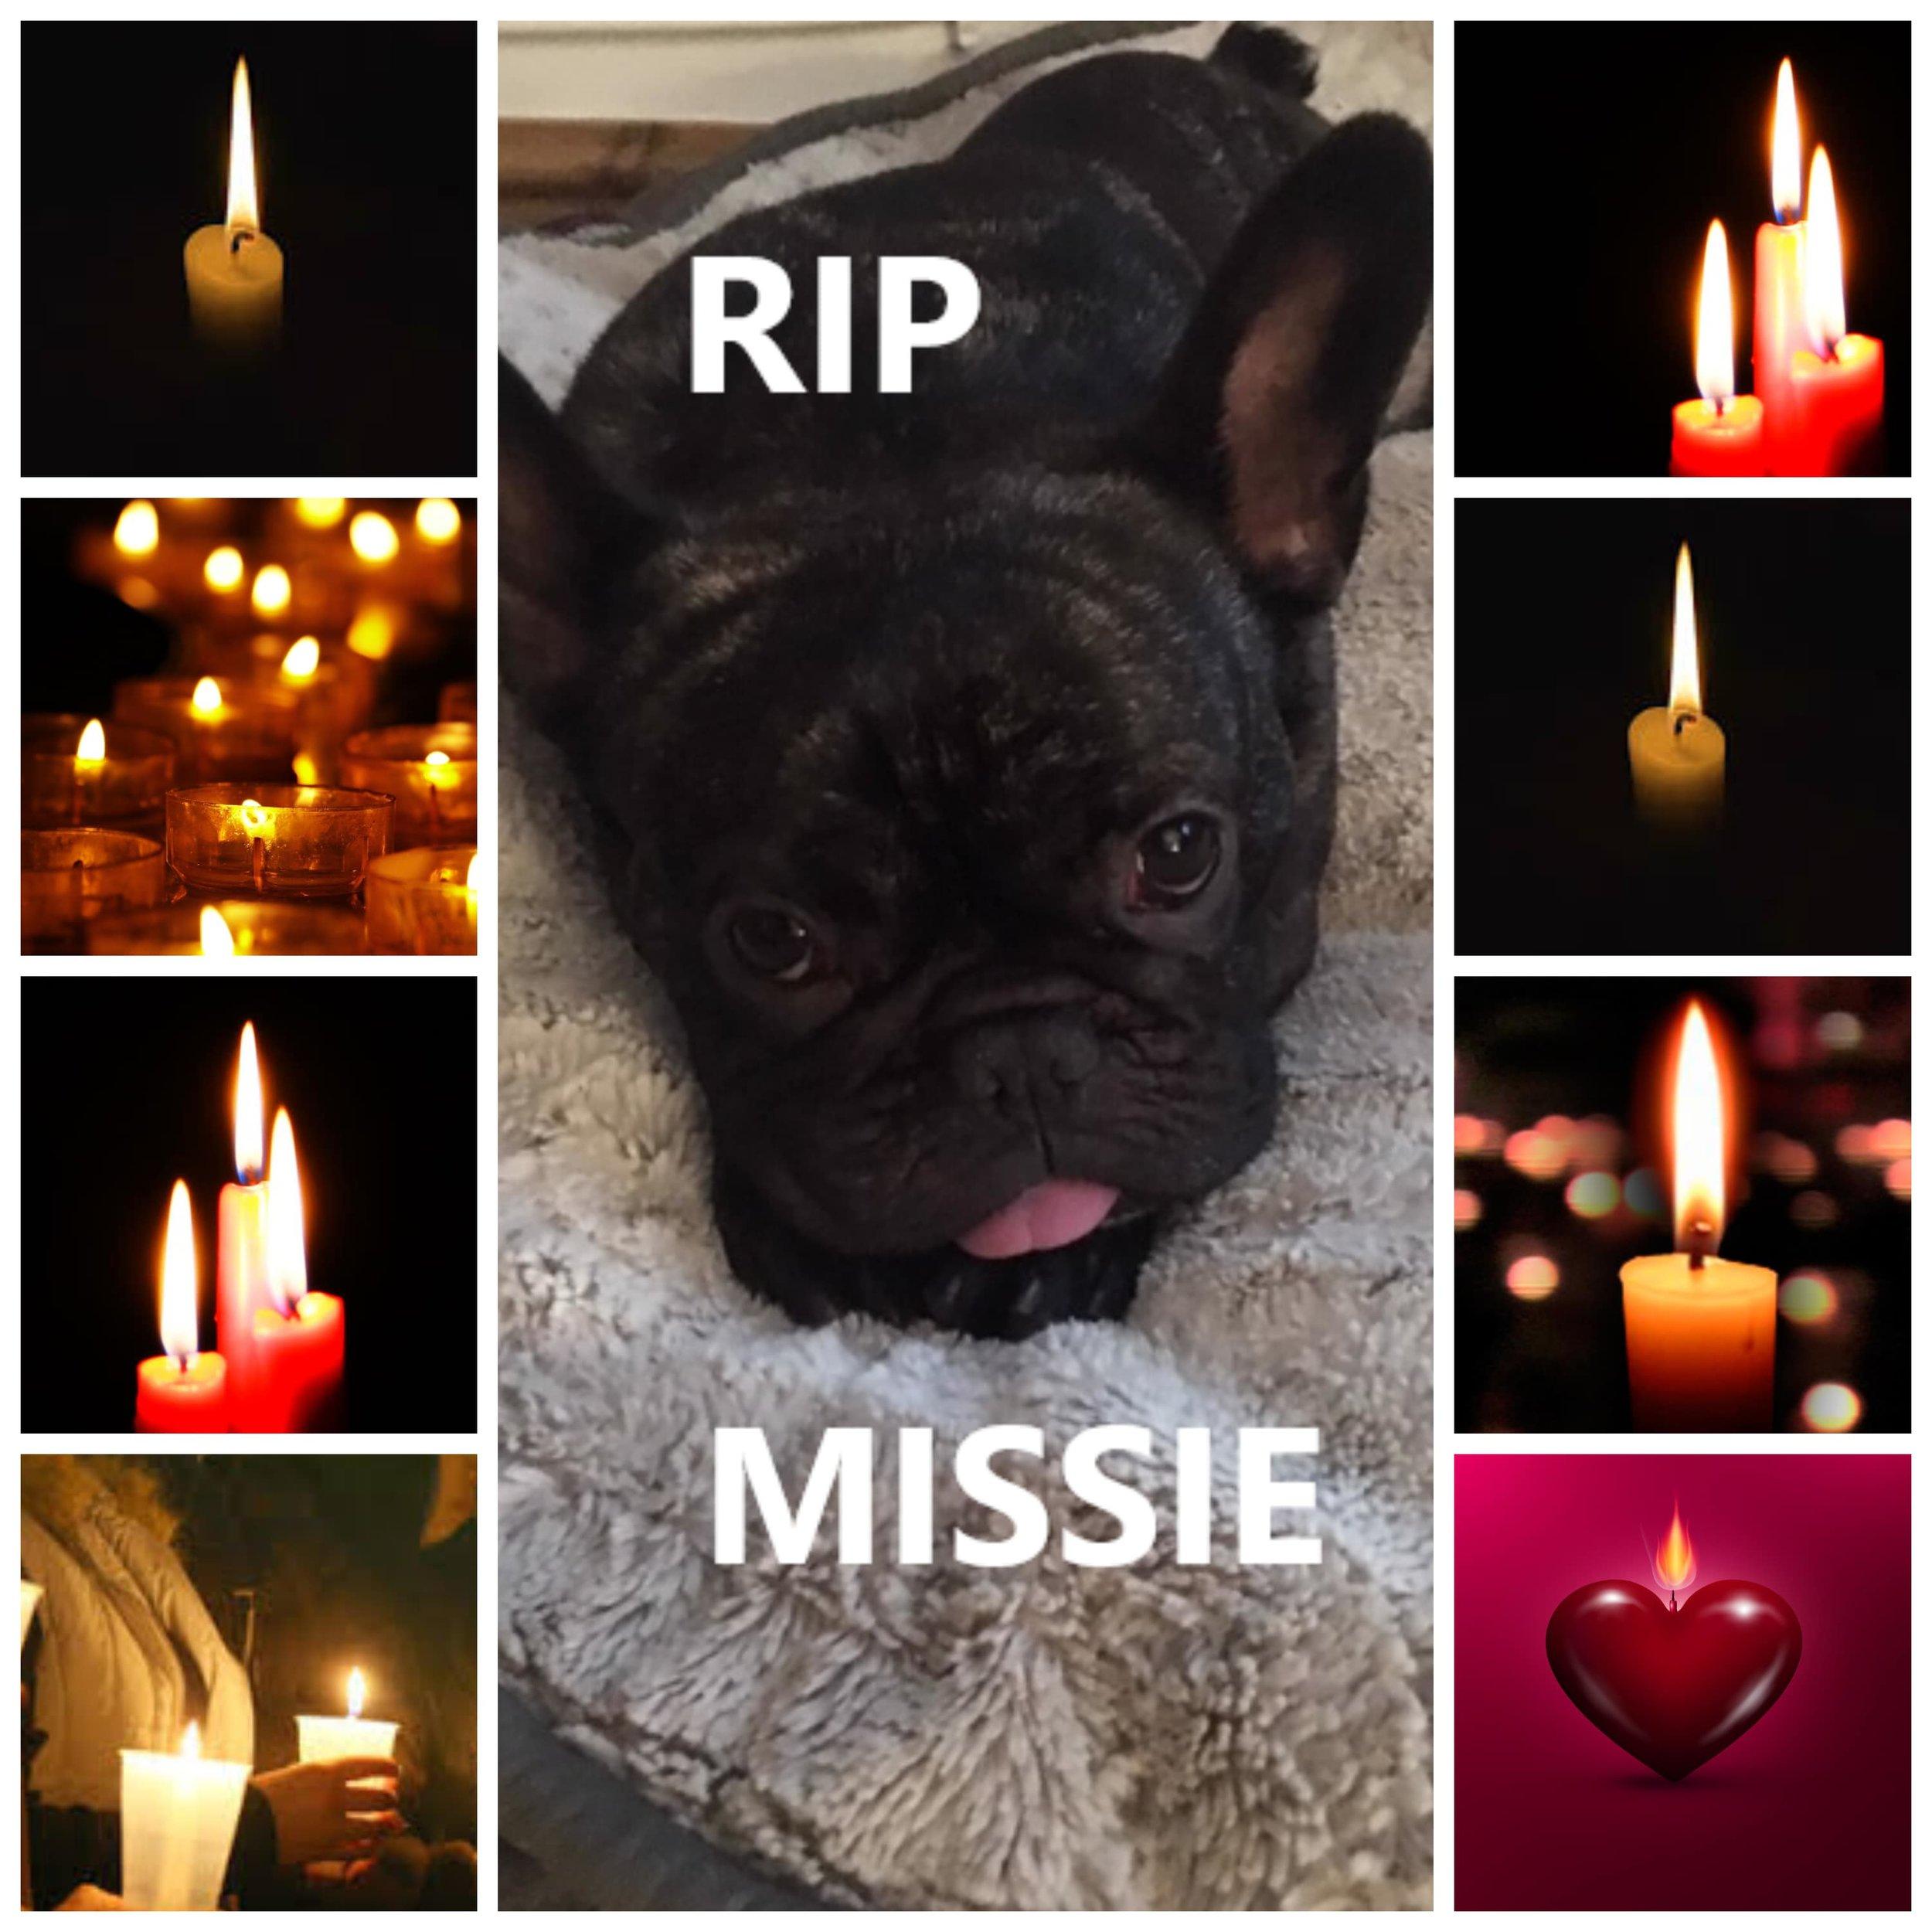 MISSIE RIP-min.jpg